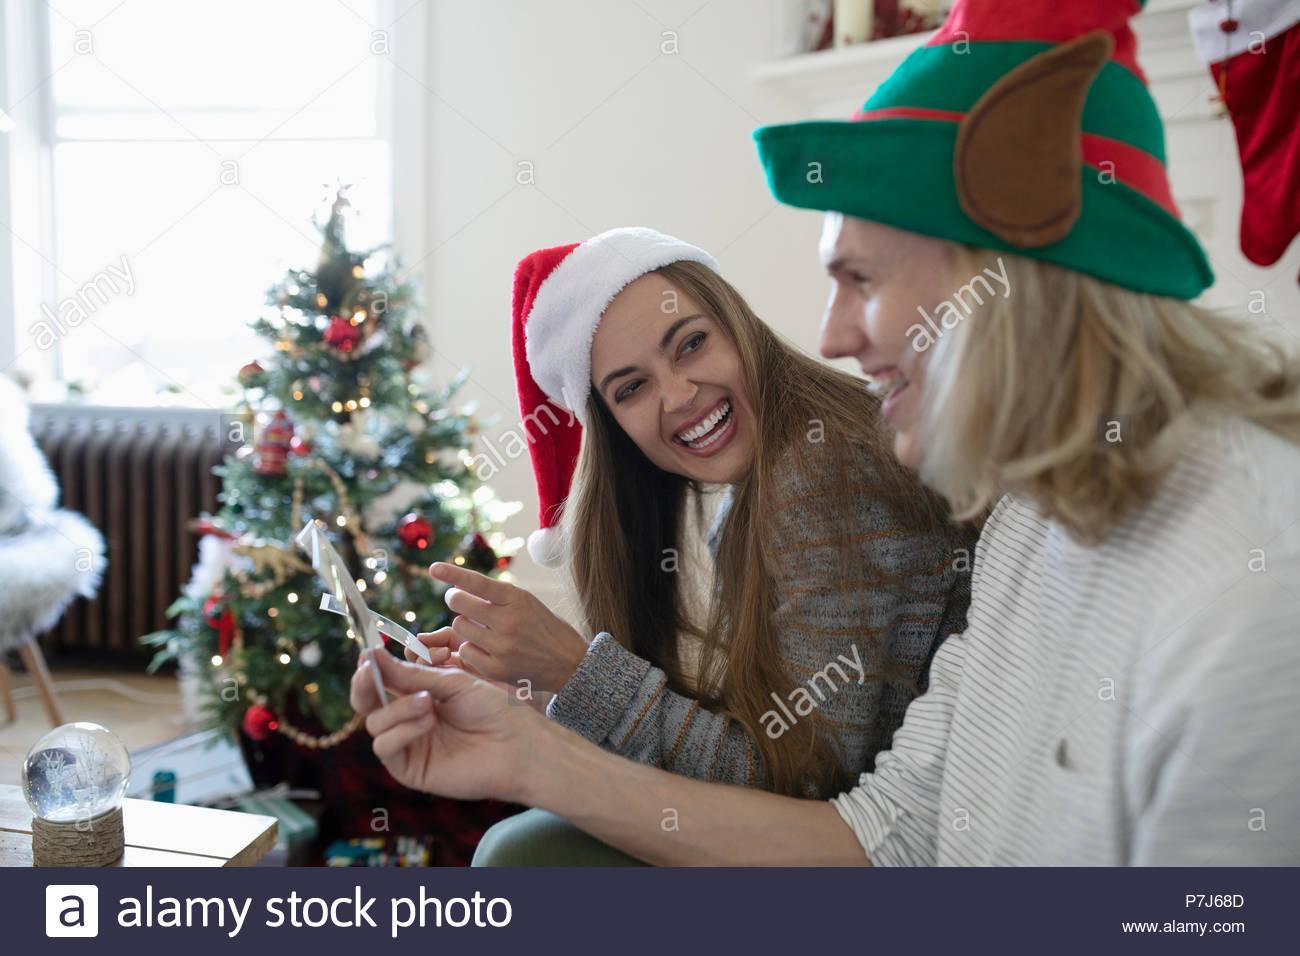 25e4e7c6913e2 Playful young couple wearing Christmas Santa and elf hats - Stock Image